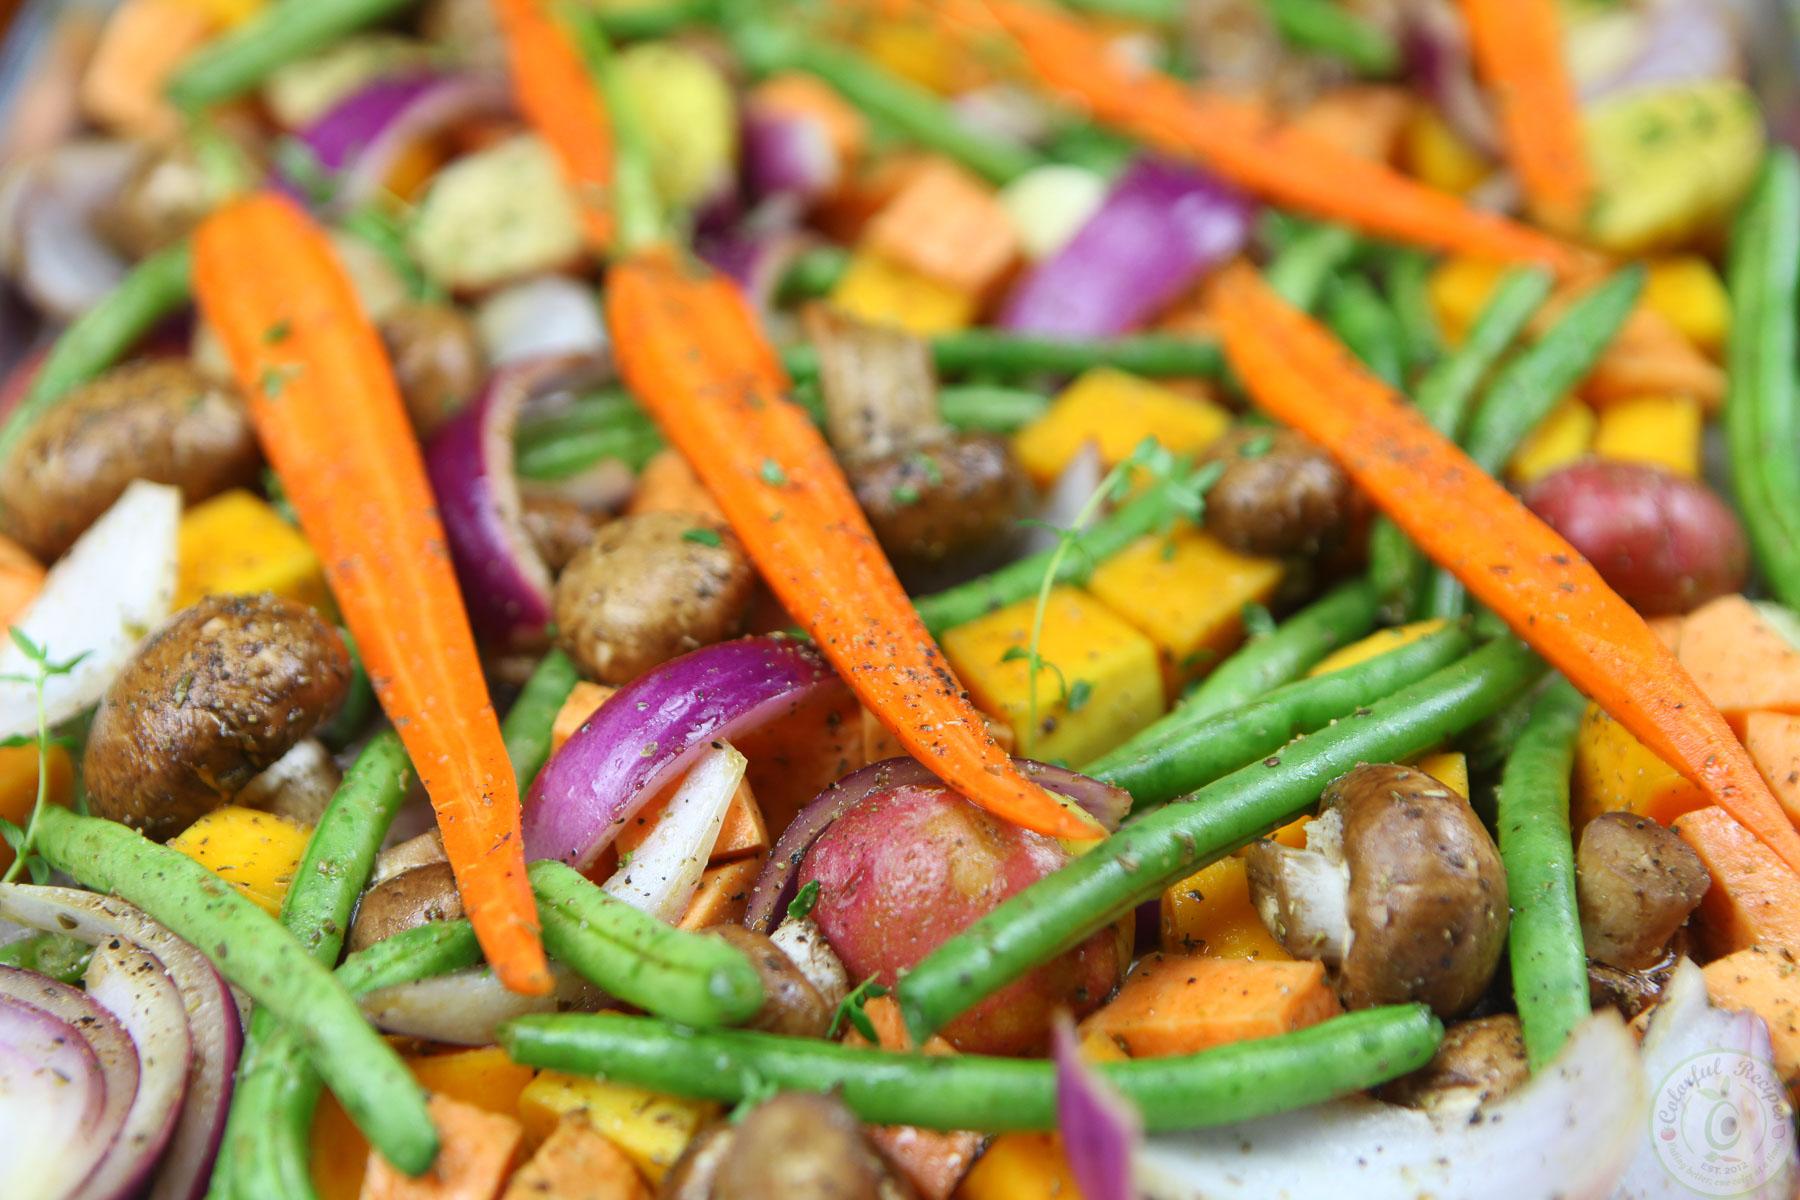 colorful veg